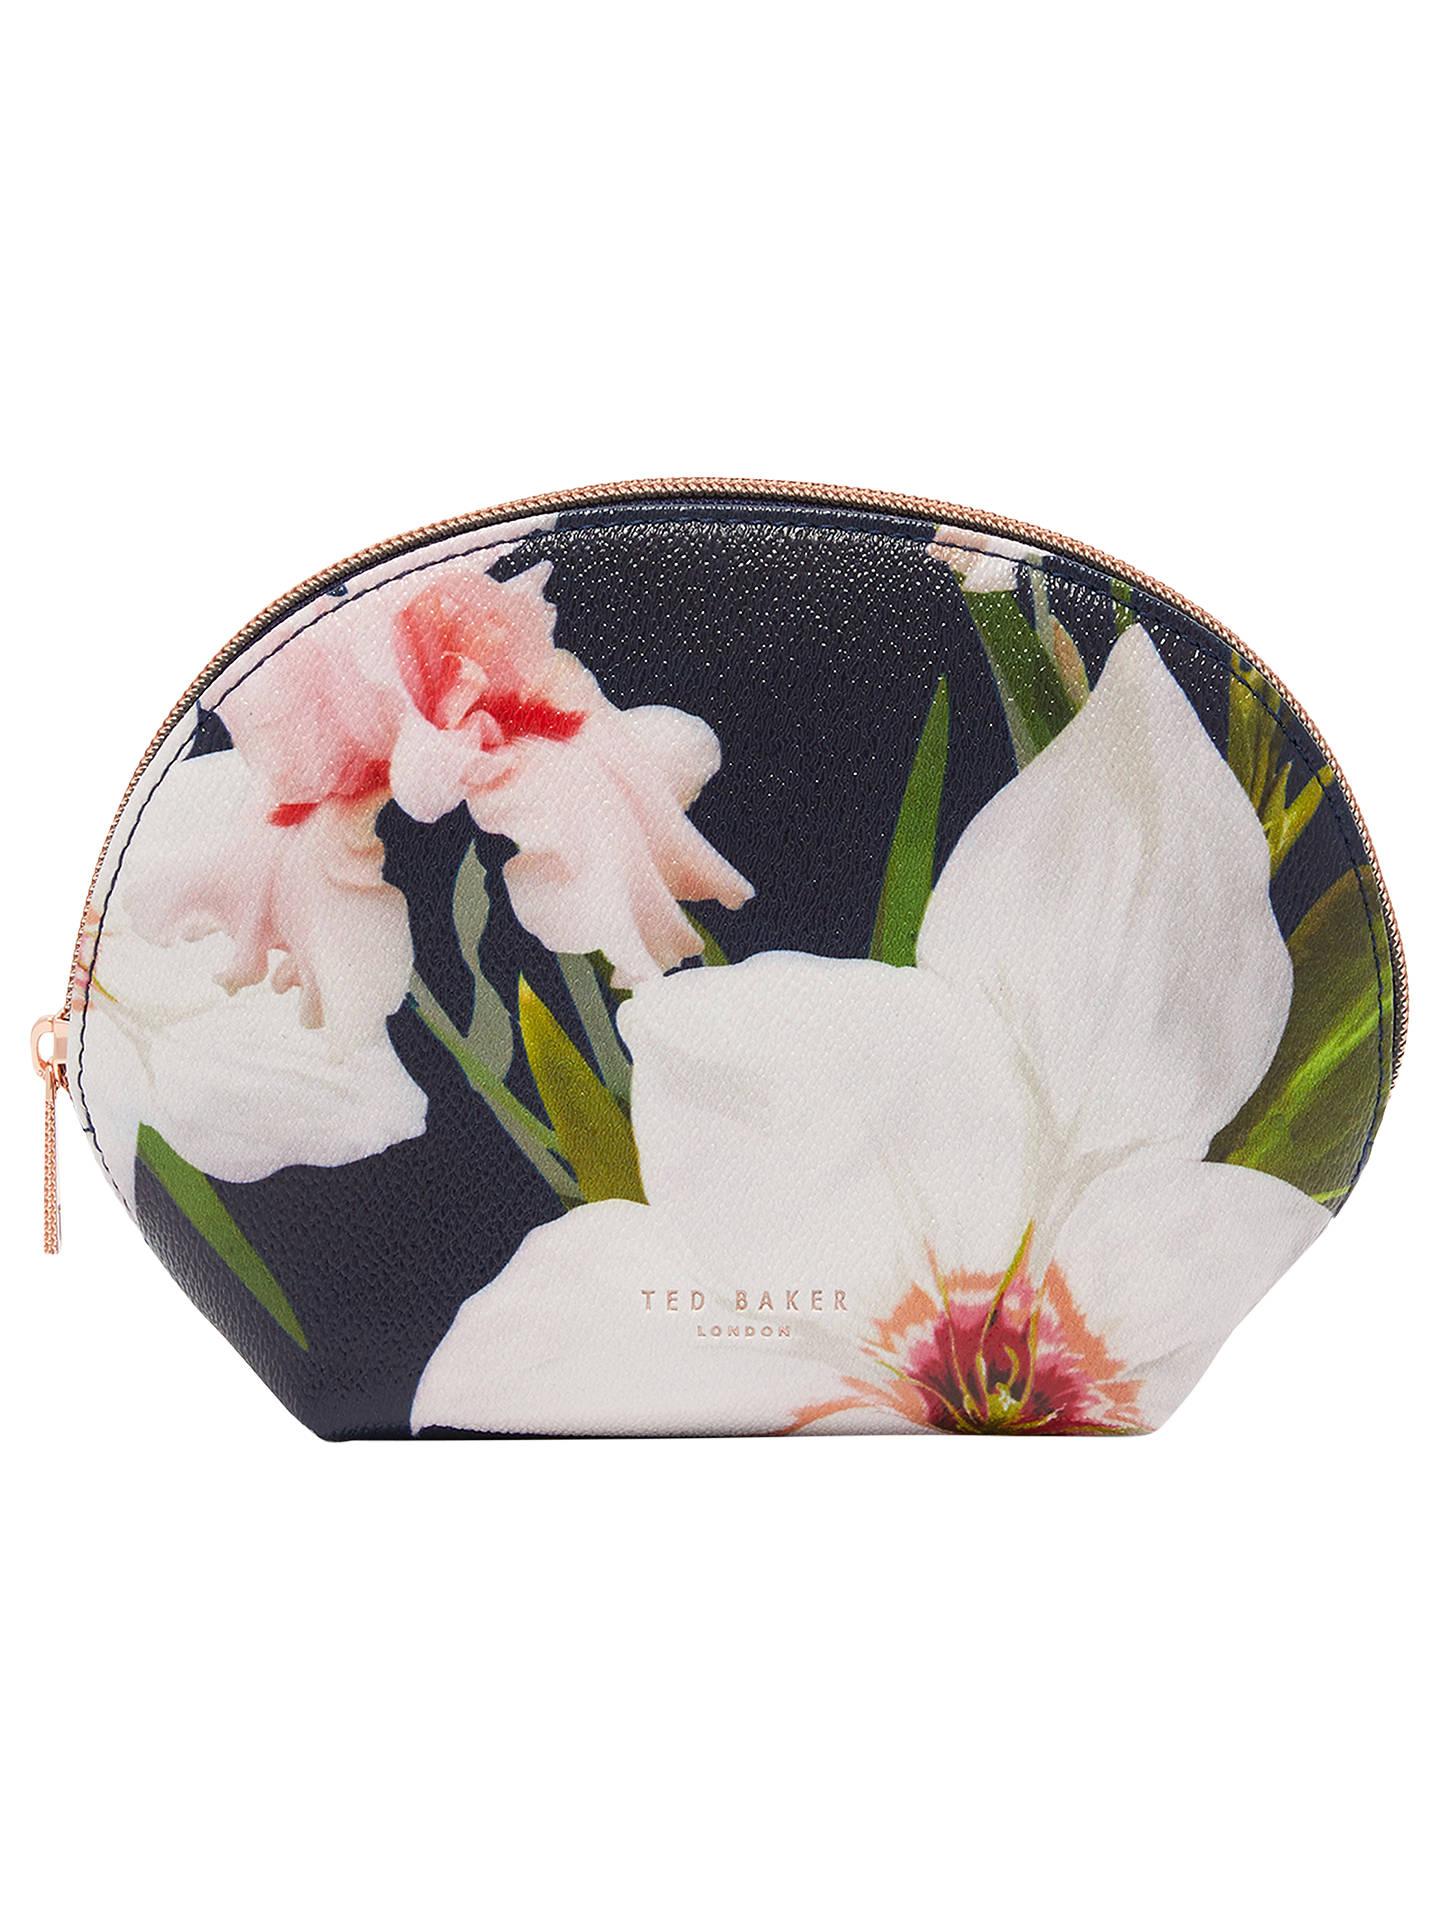 2b03a0e73 Buy Ted Baker Margita Chatsworth Dome Make Up Bag